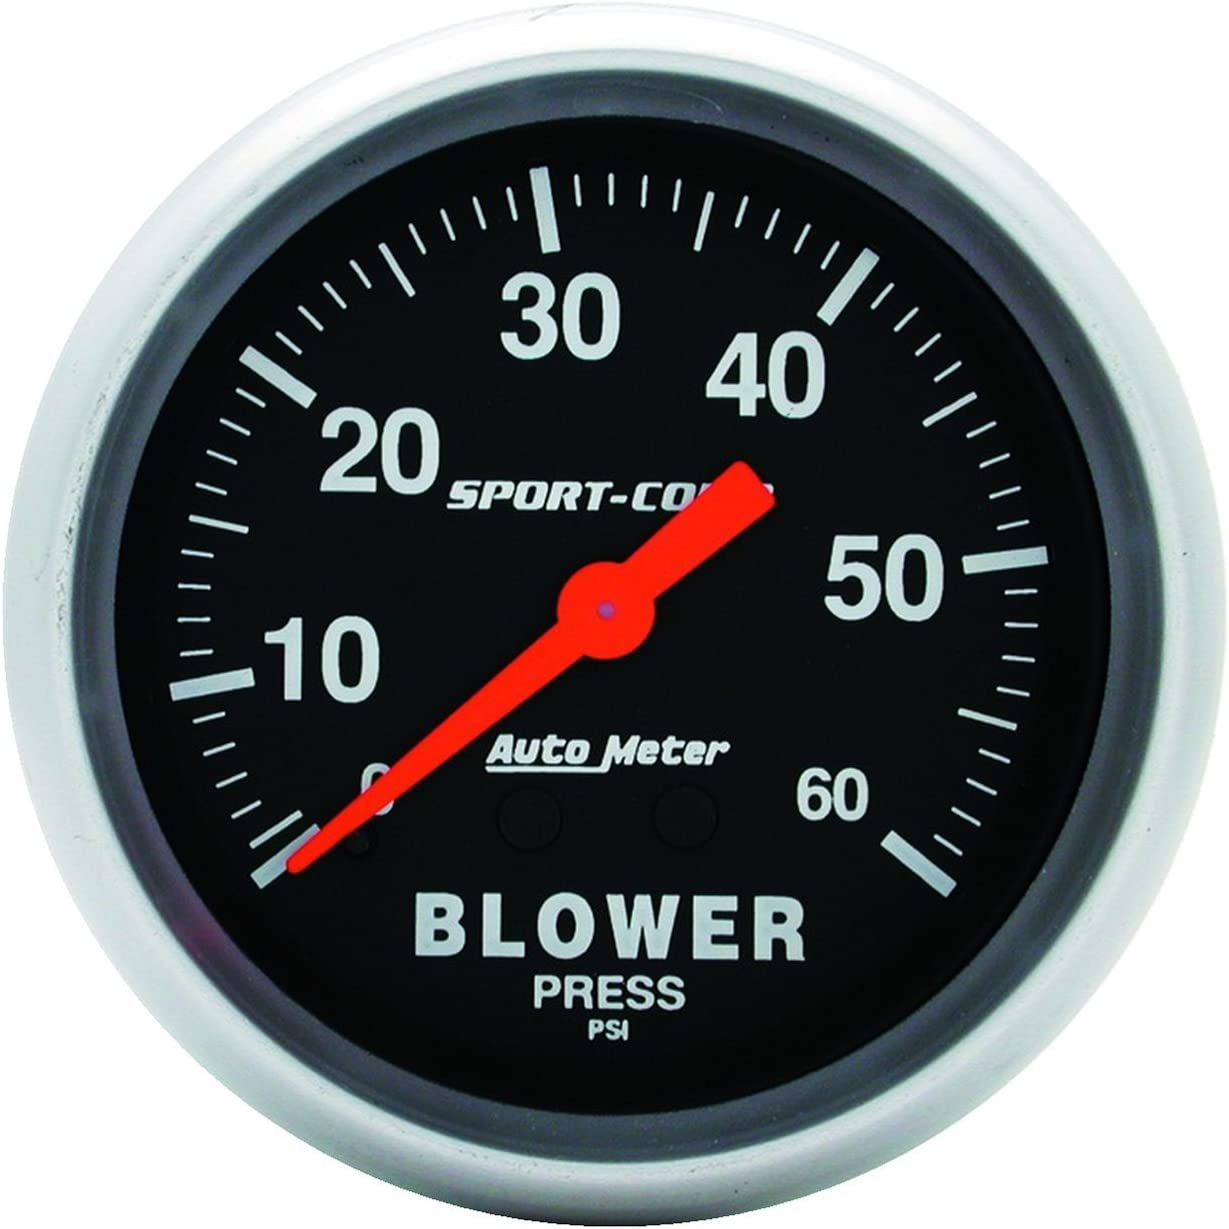 Auto Meter 3402 Sport-Comp Mechanical Blower Pressure Gauge